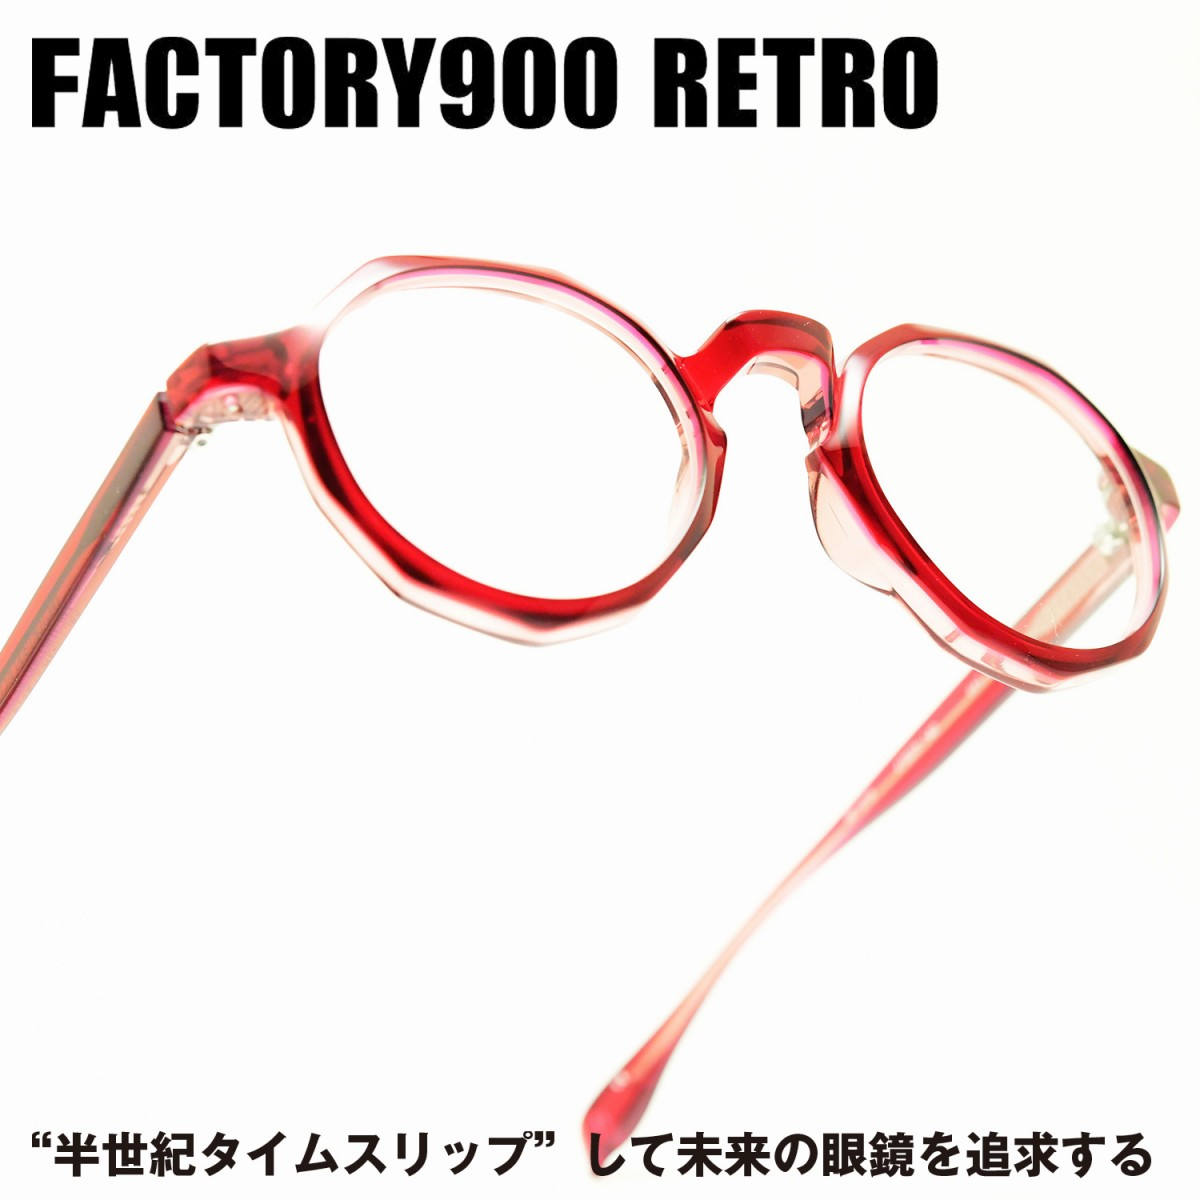 FACTORY900 RETRO ファクトリー900レトロRF-015 col-238